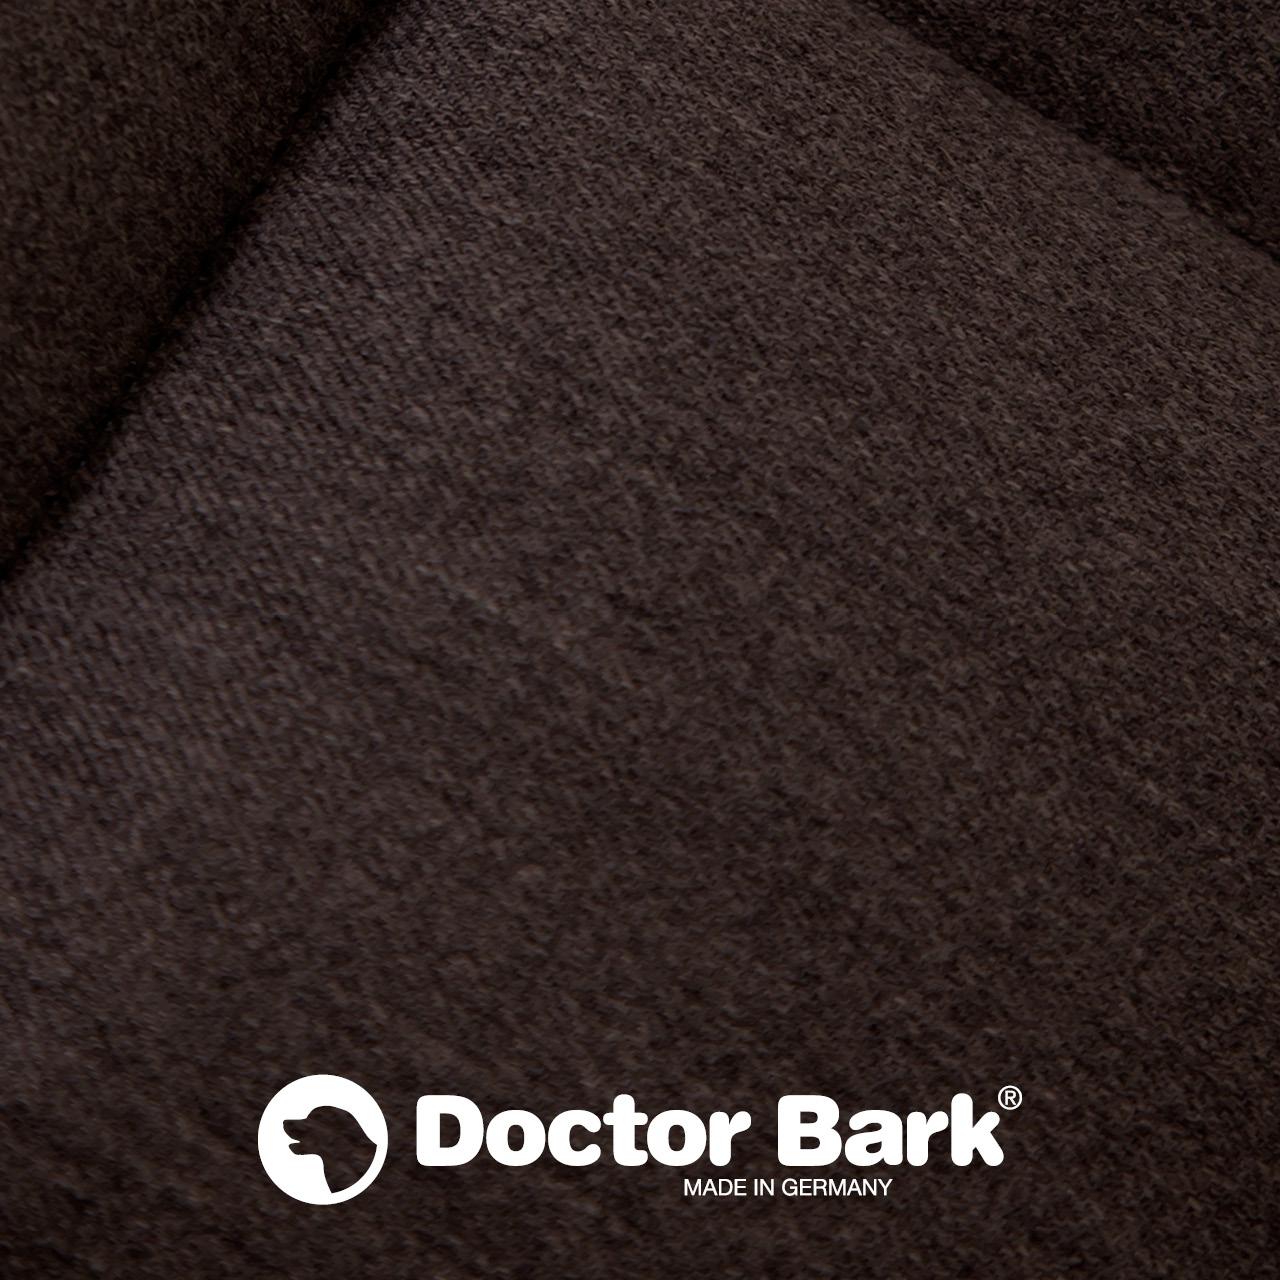 eckiges Doctor Bark Hundebett mit Rand Gr. XL - braun